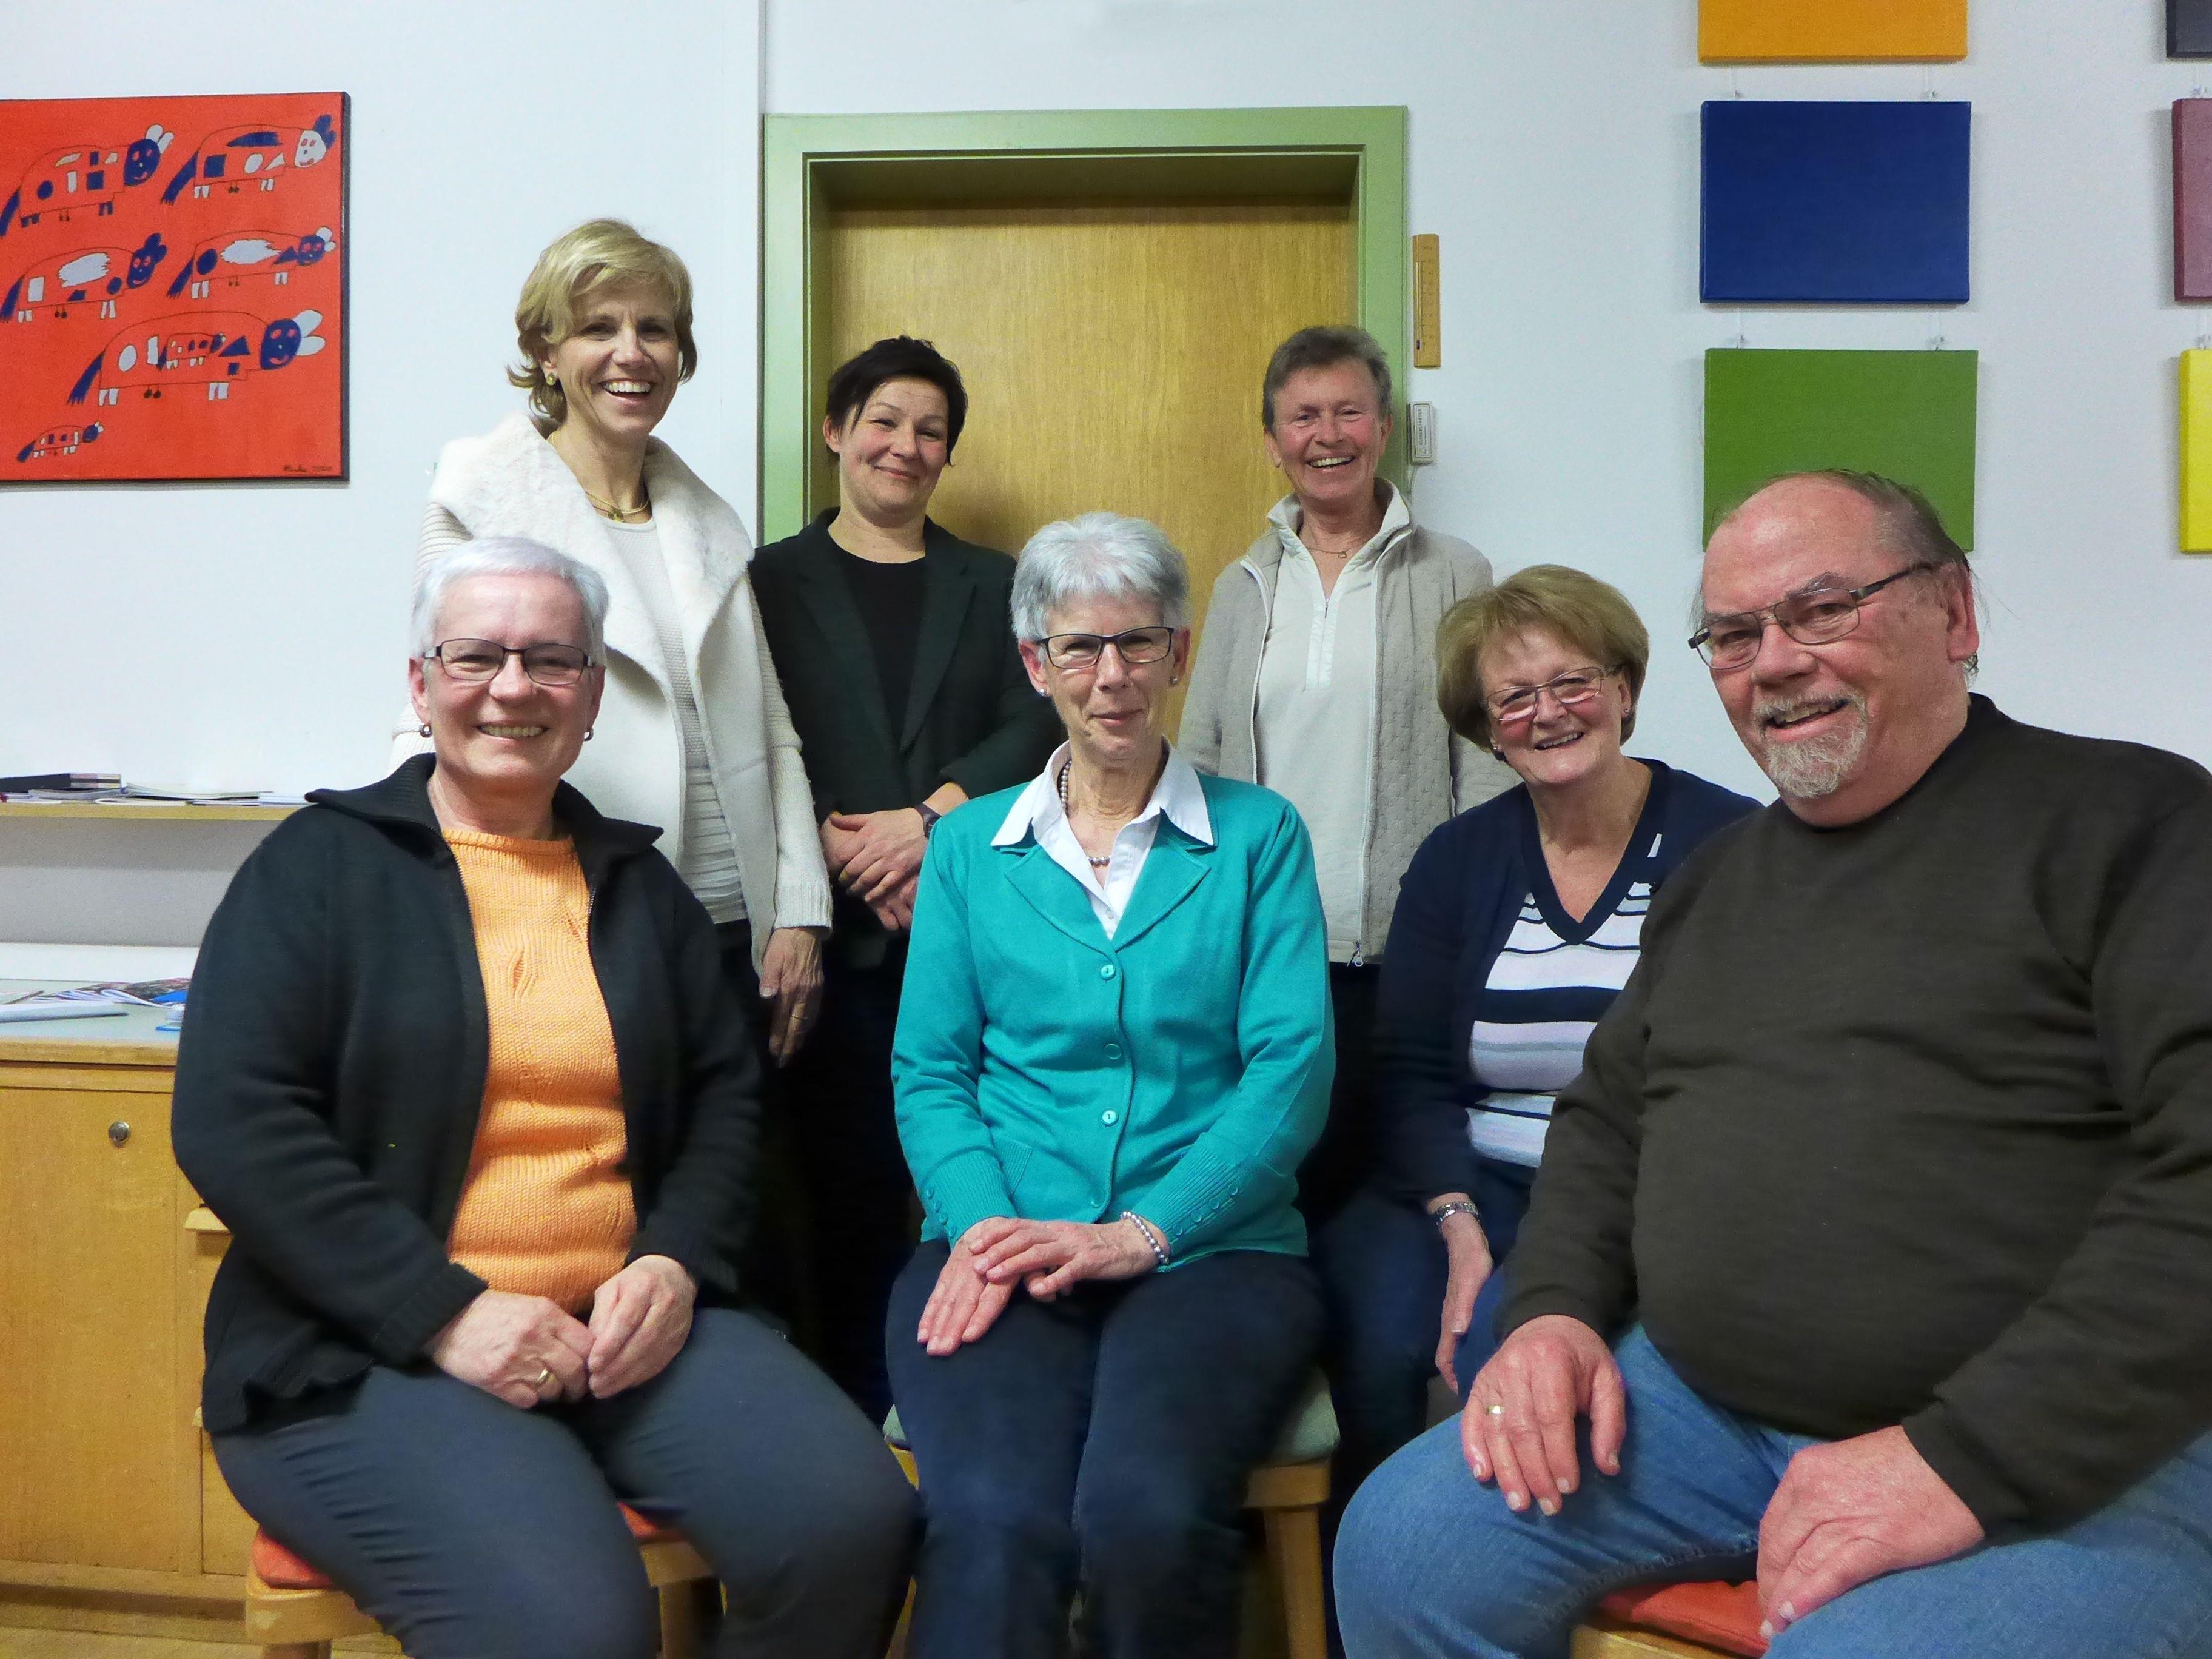 Das engagierte Team des Gesunden Lebensraums Gisingen bei der Vereinsgründung heuer.